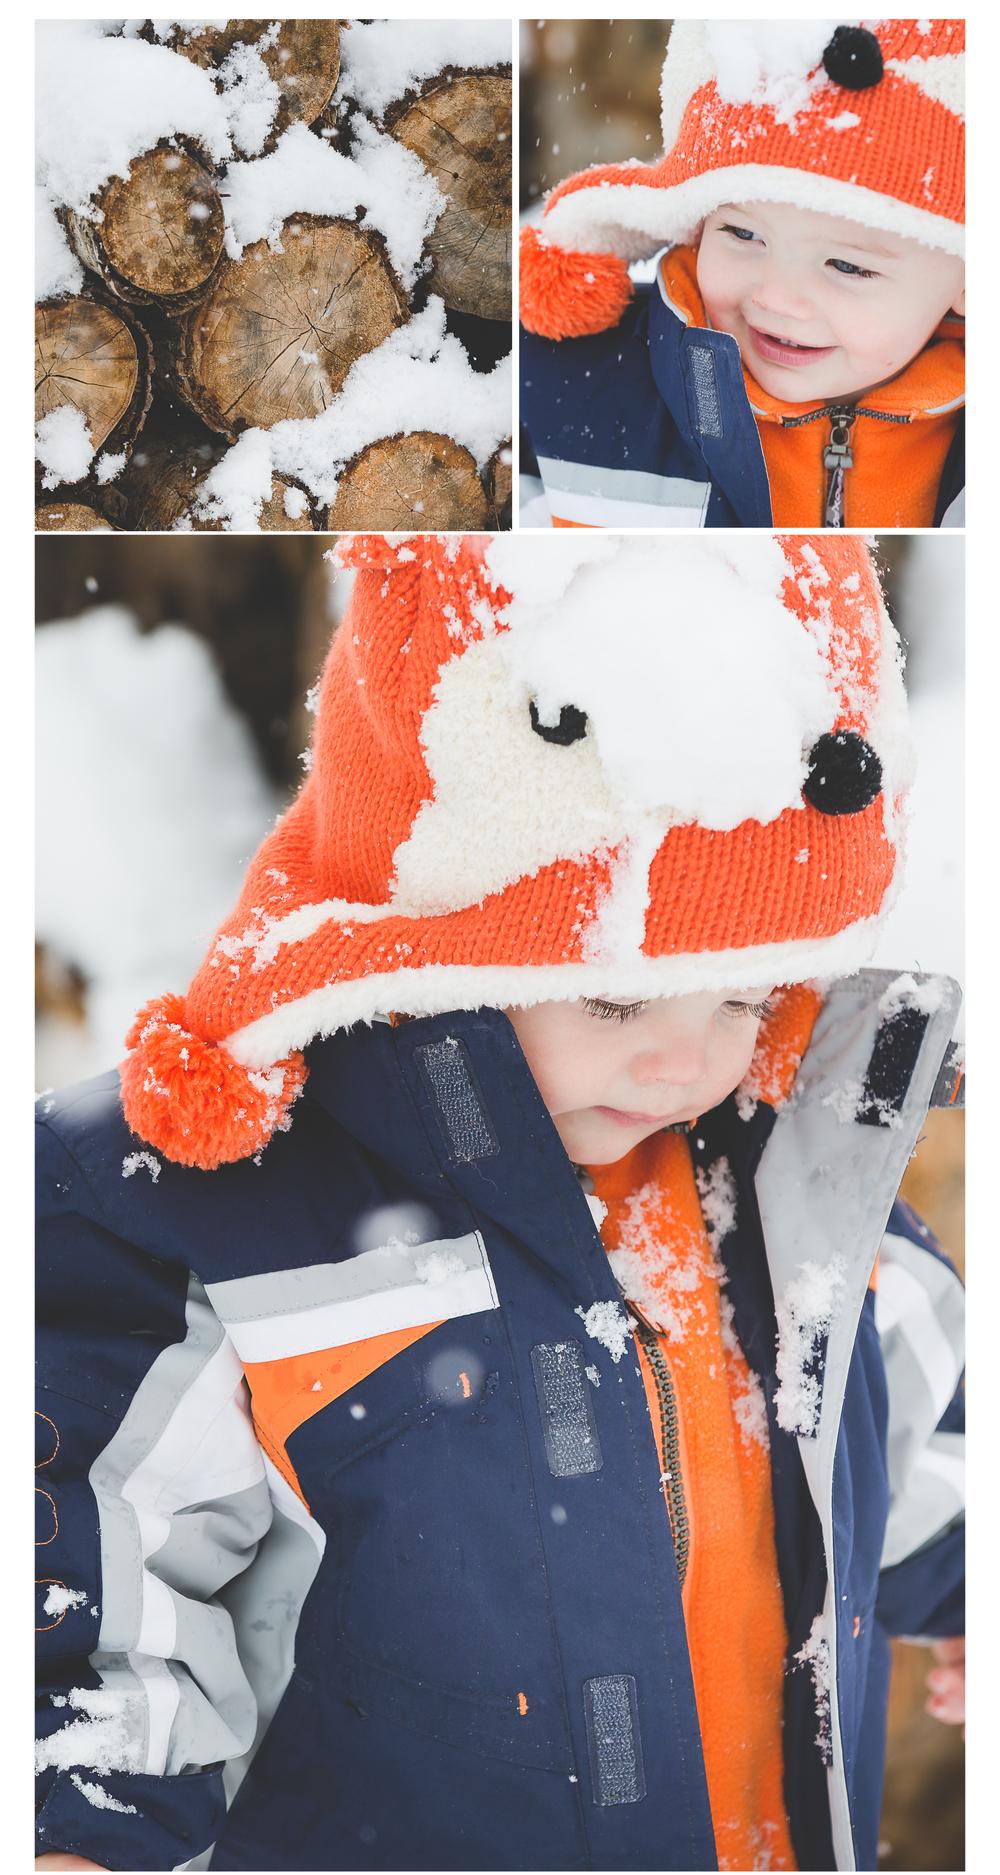 snowy-blog -1.jpg